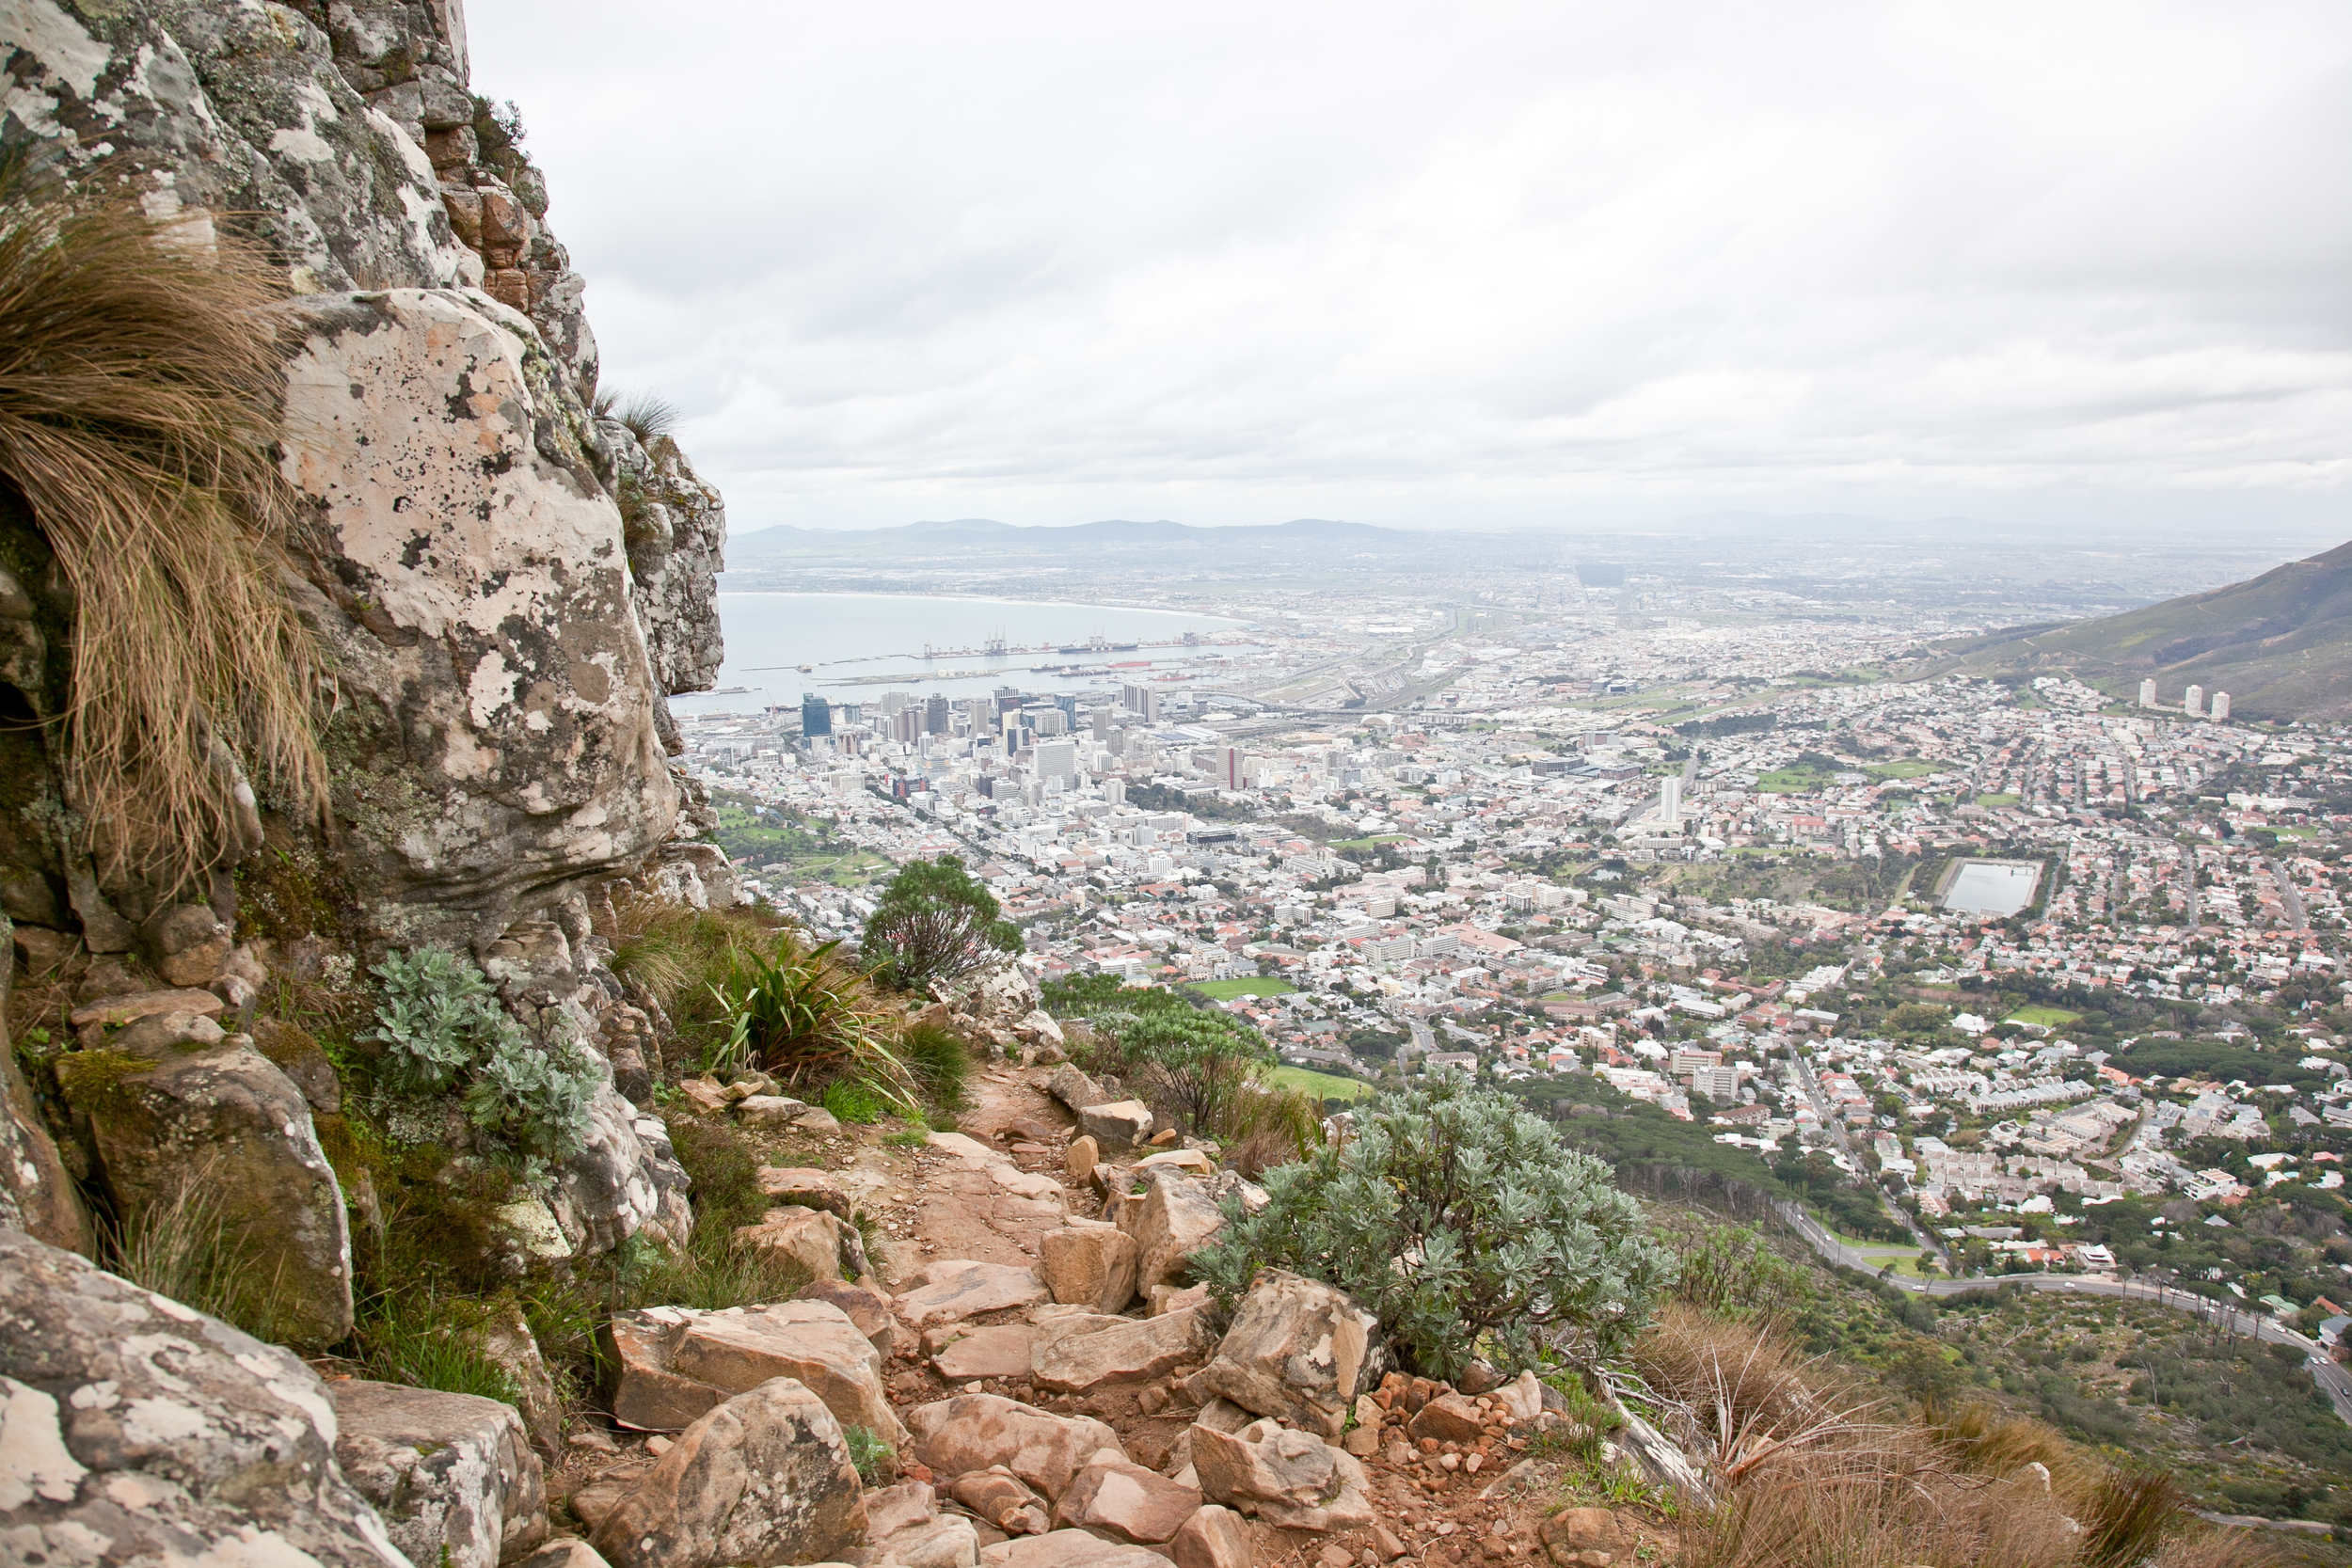 IMG_5050-hiking-lions-head-cape-town-trisa-taro.jpg